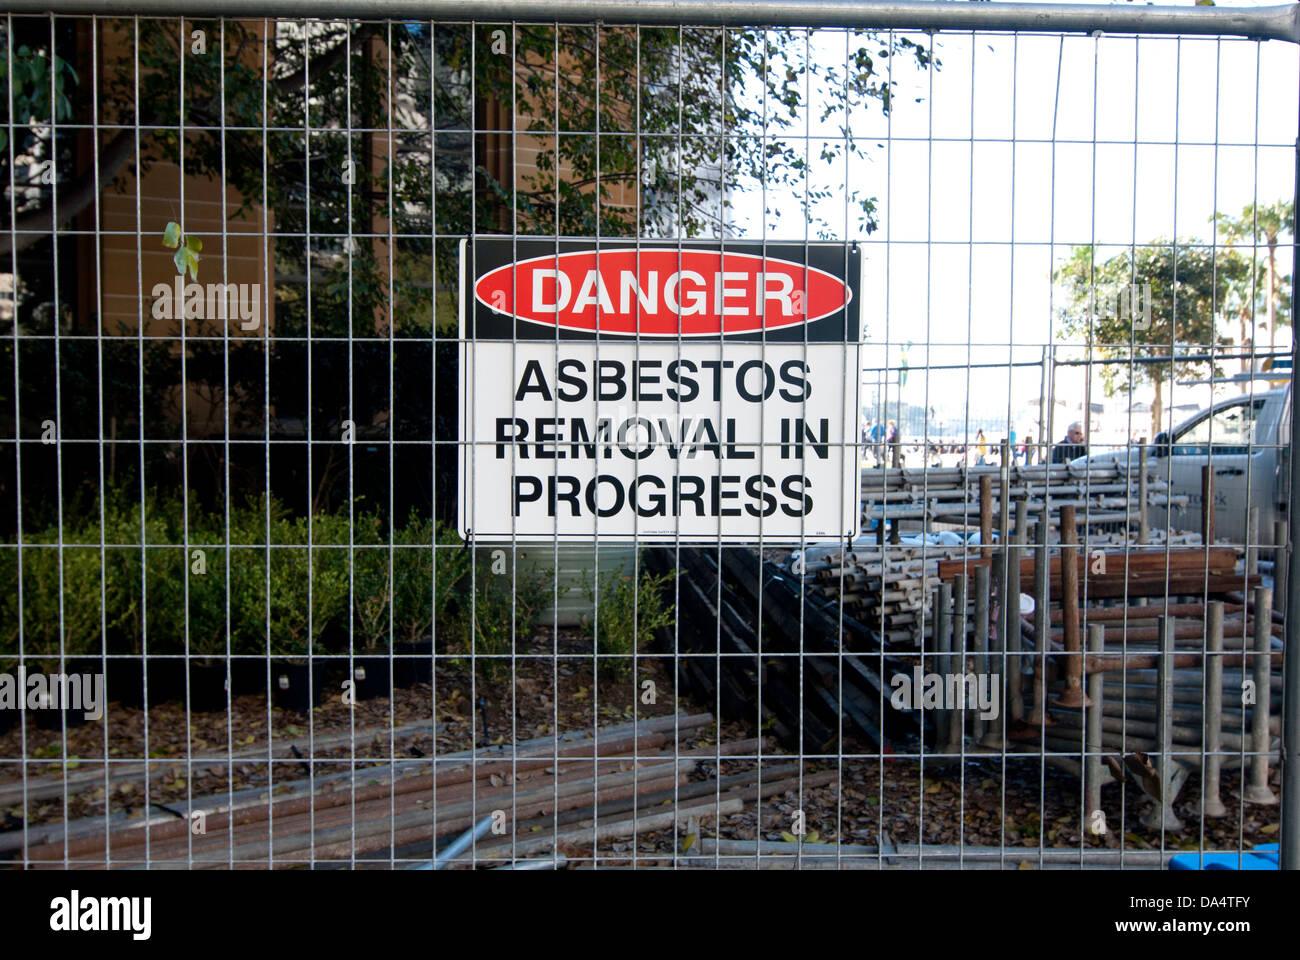 Signage warning of danger due to asbestos removal, Circular Quay, Sydney, Australia - Stock Image